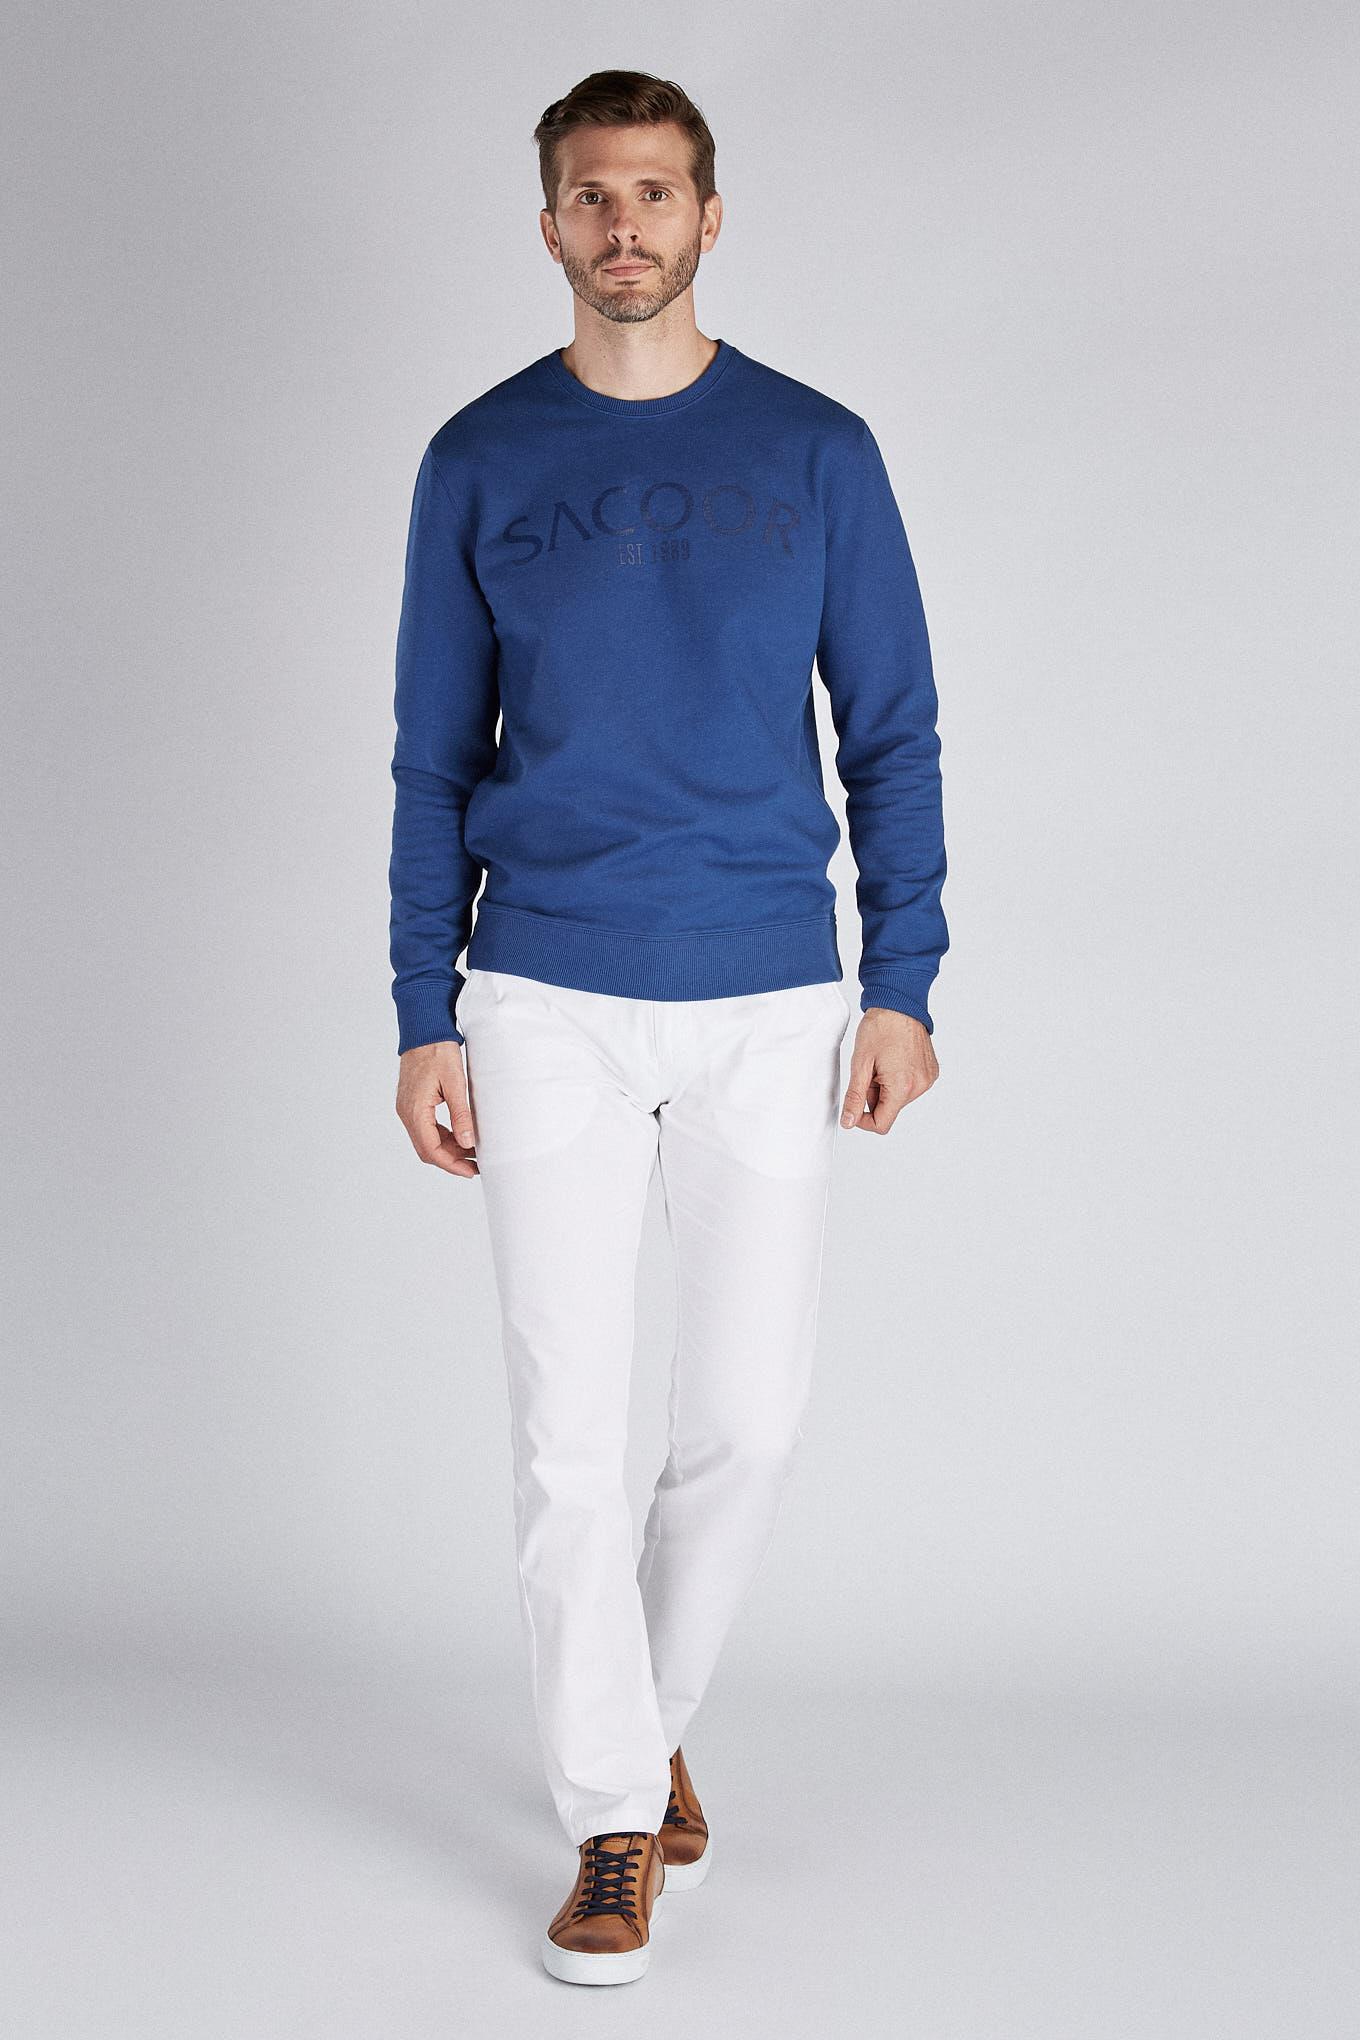 Sweatshirt Indigo Sport Man